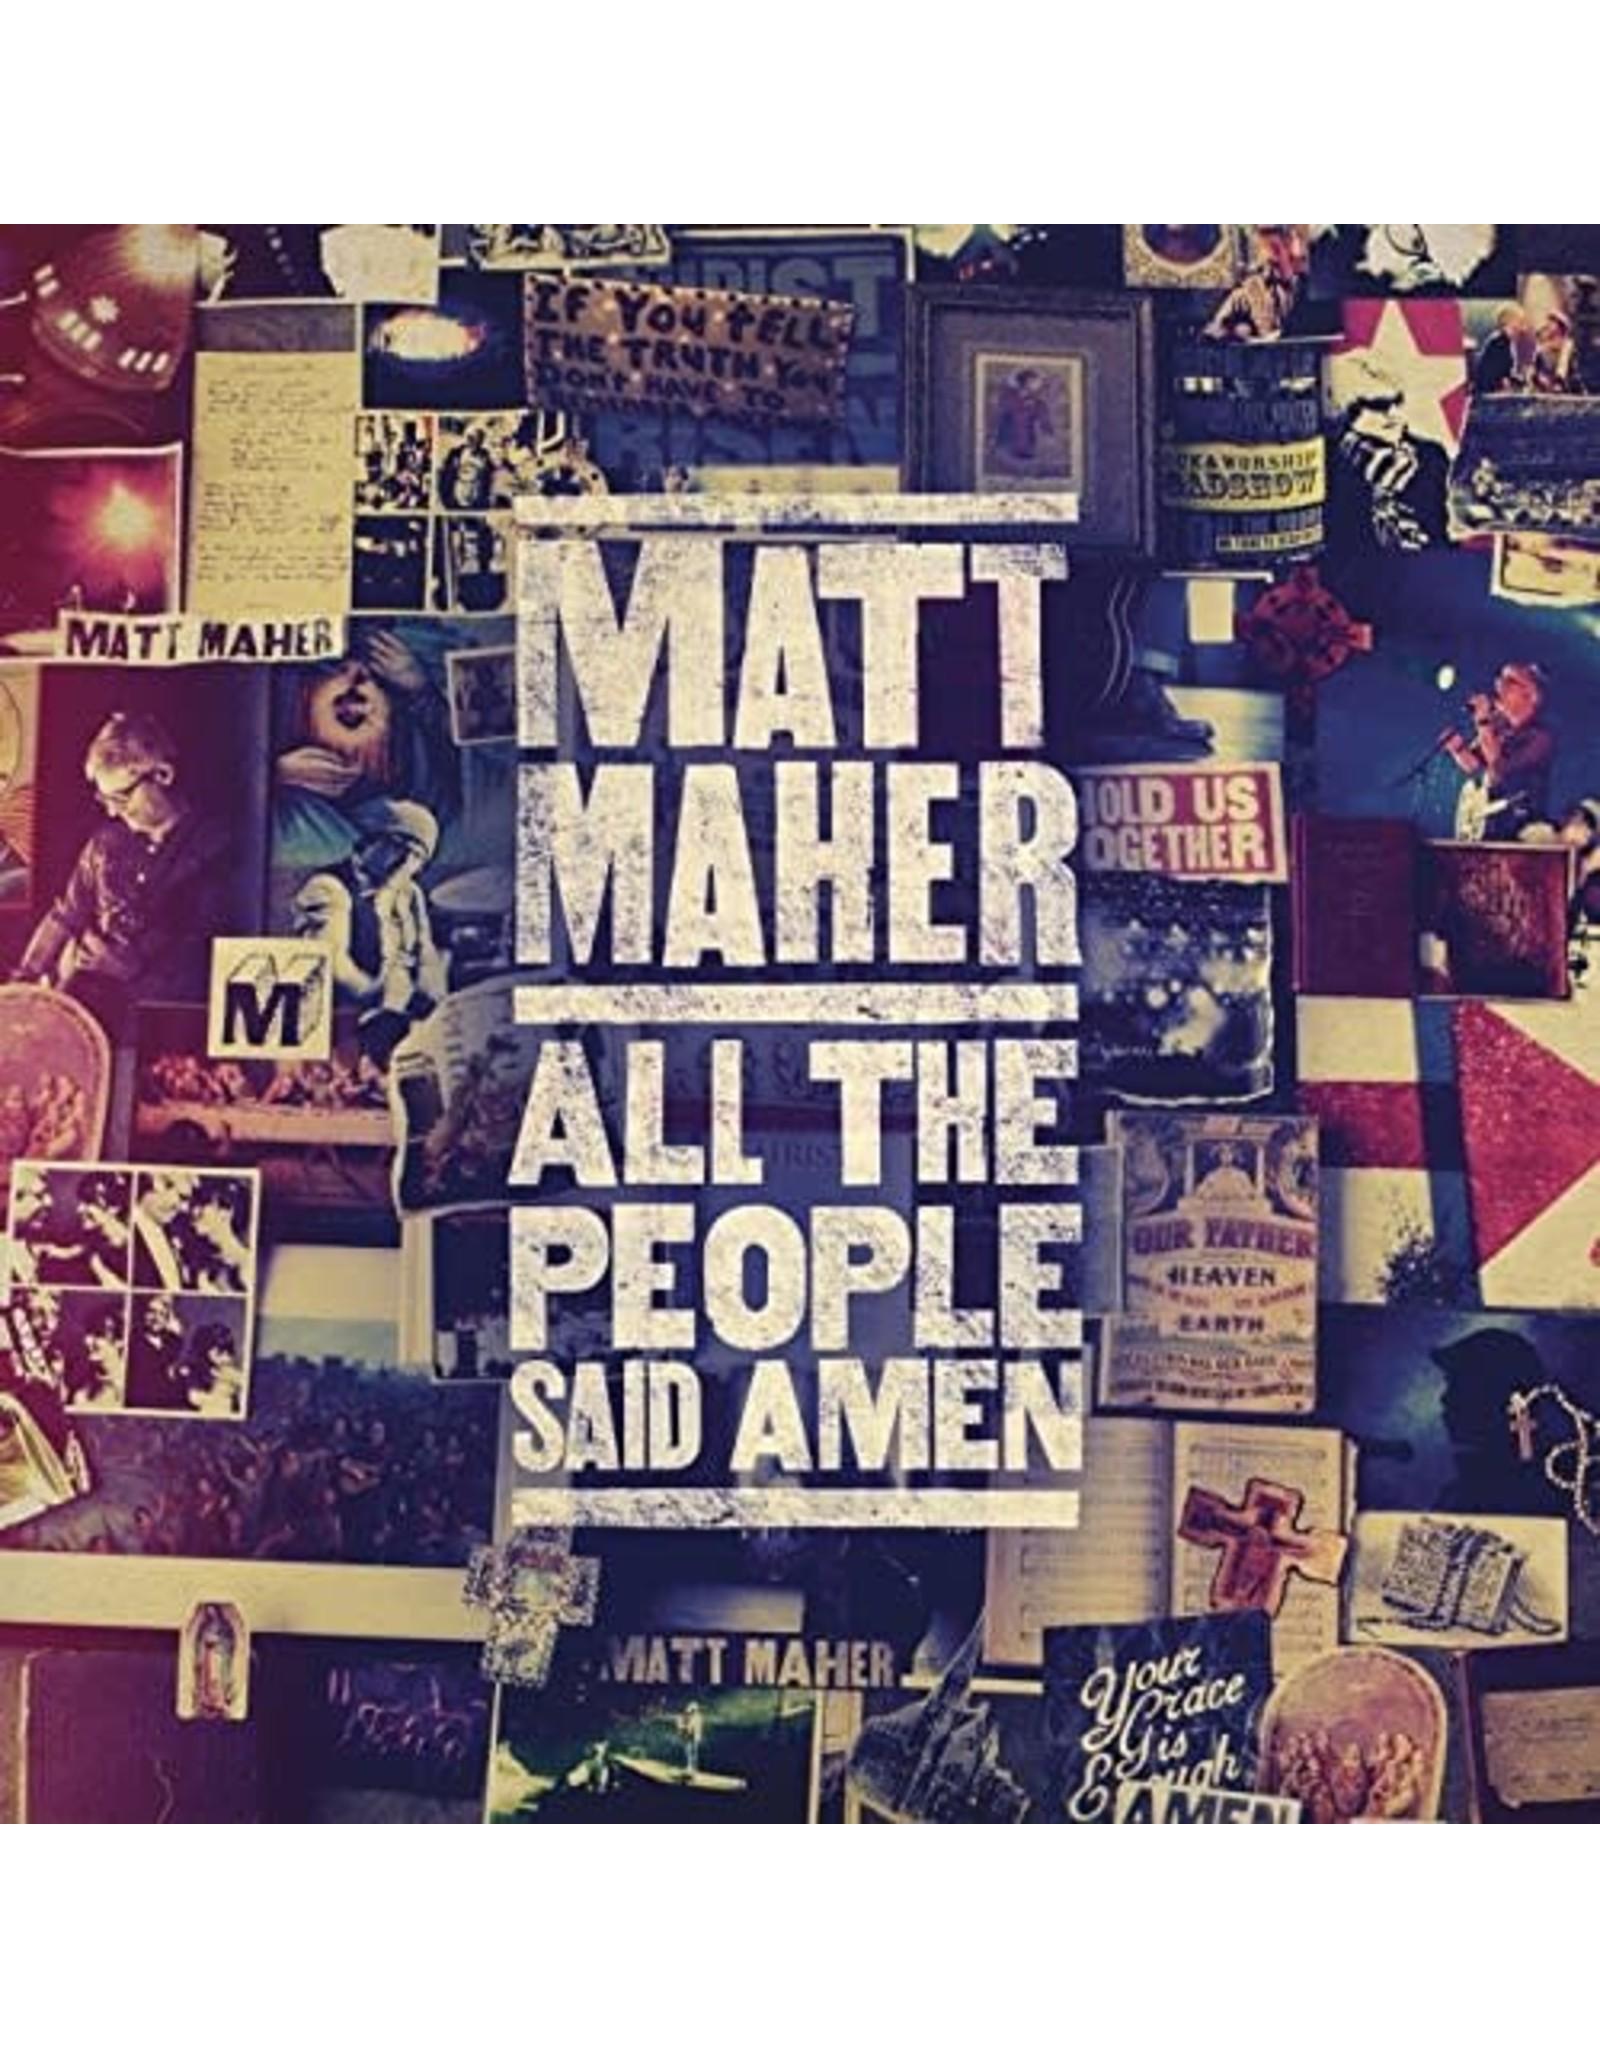 All the People Said Amen CD - Matt Maher